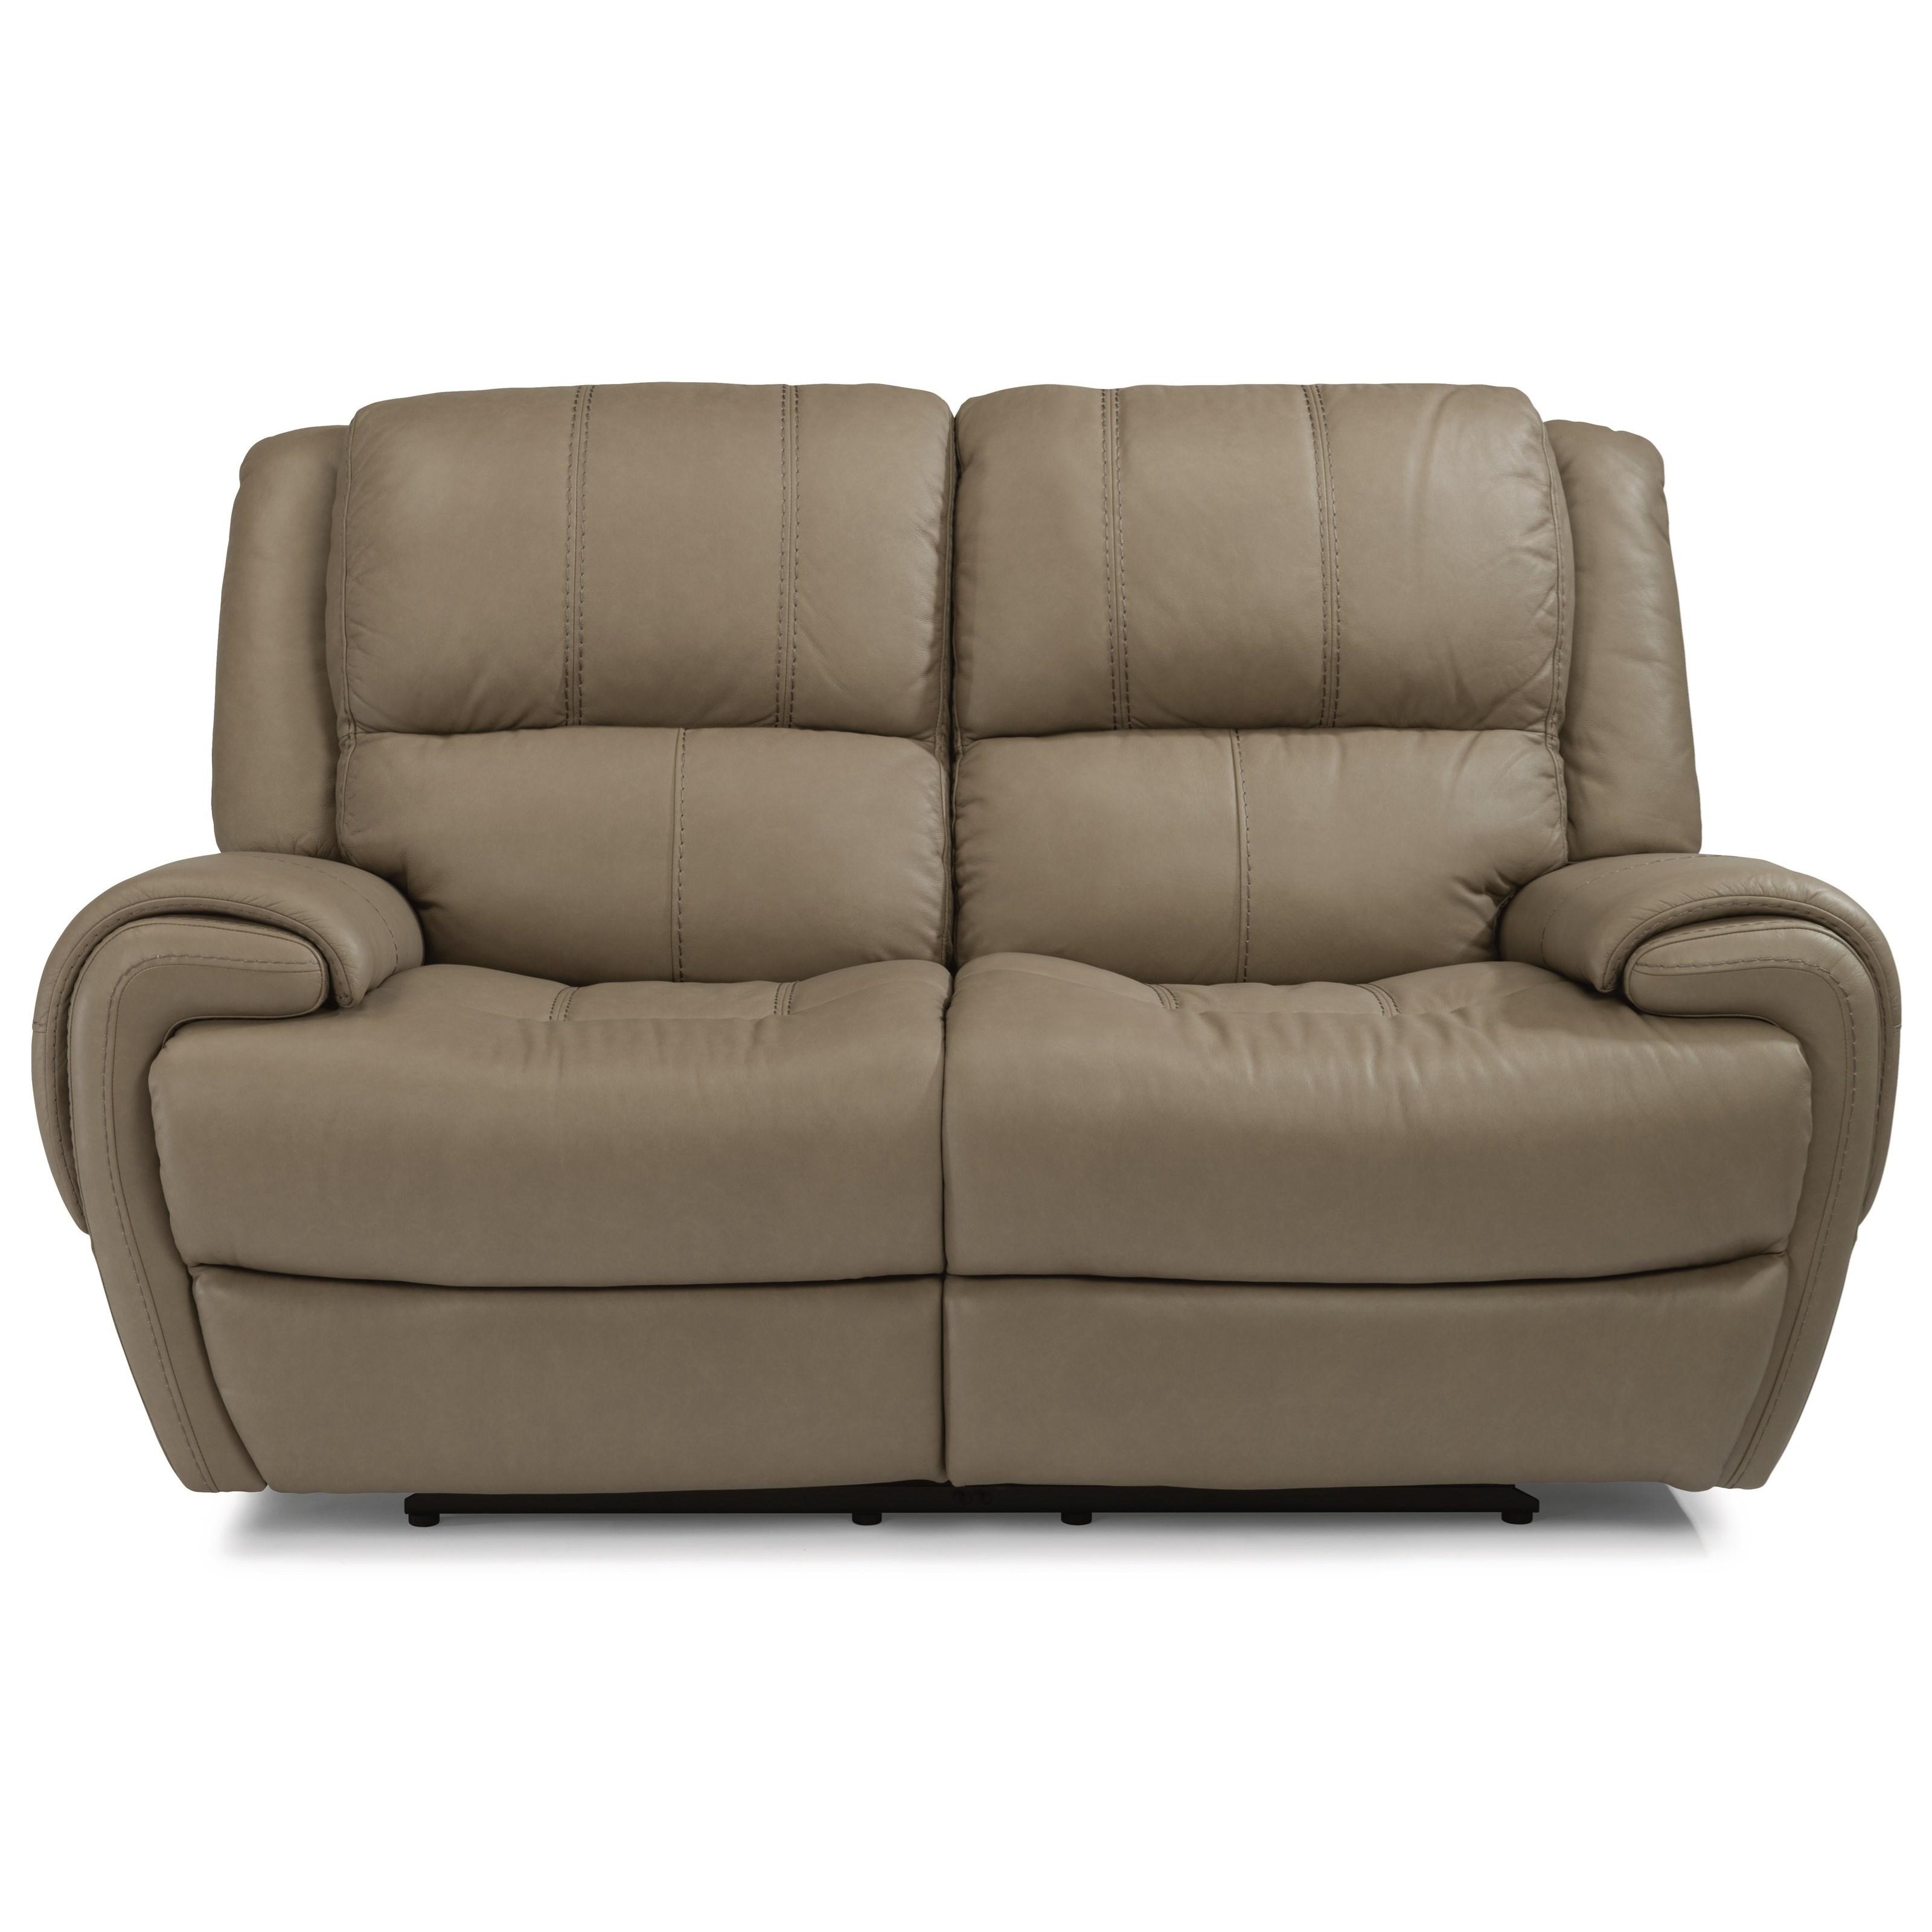 Latitudes-Nance Power Reclining Loveseat with Power Headrest by Flexsteel at Walker's Furniture